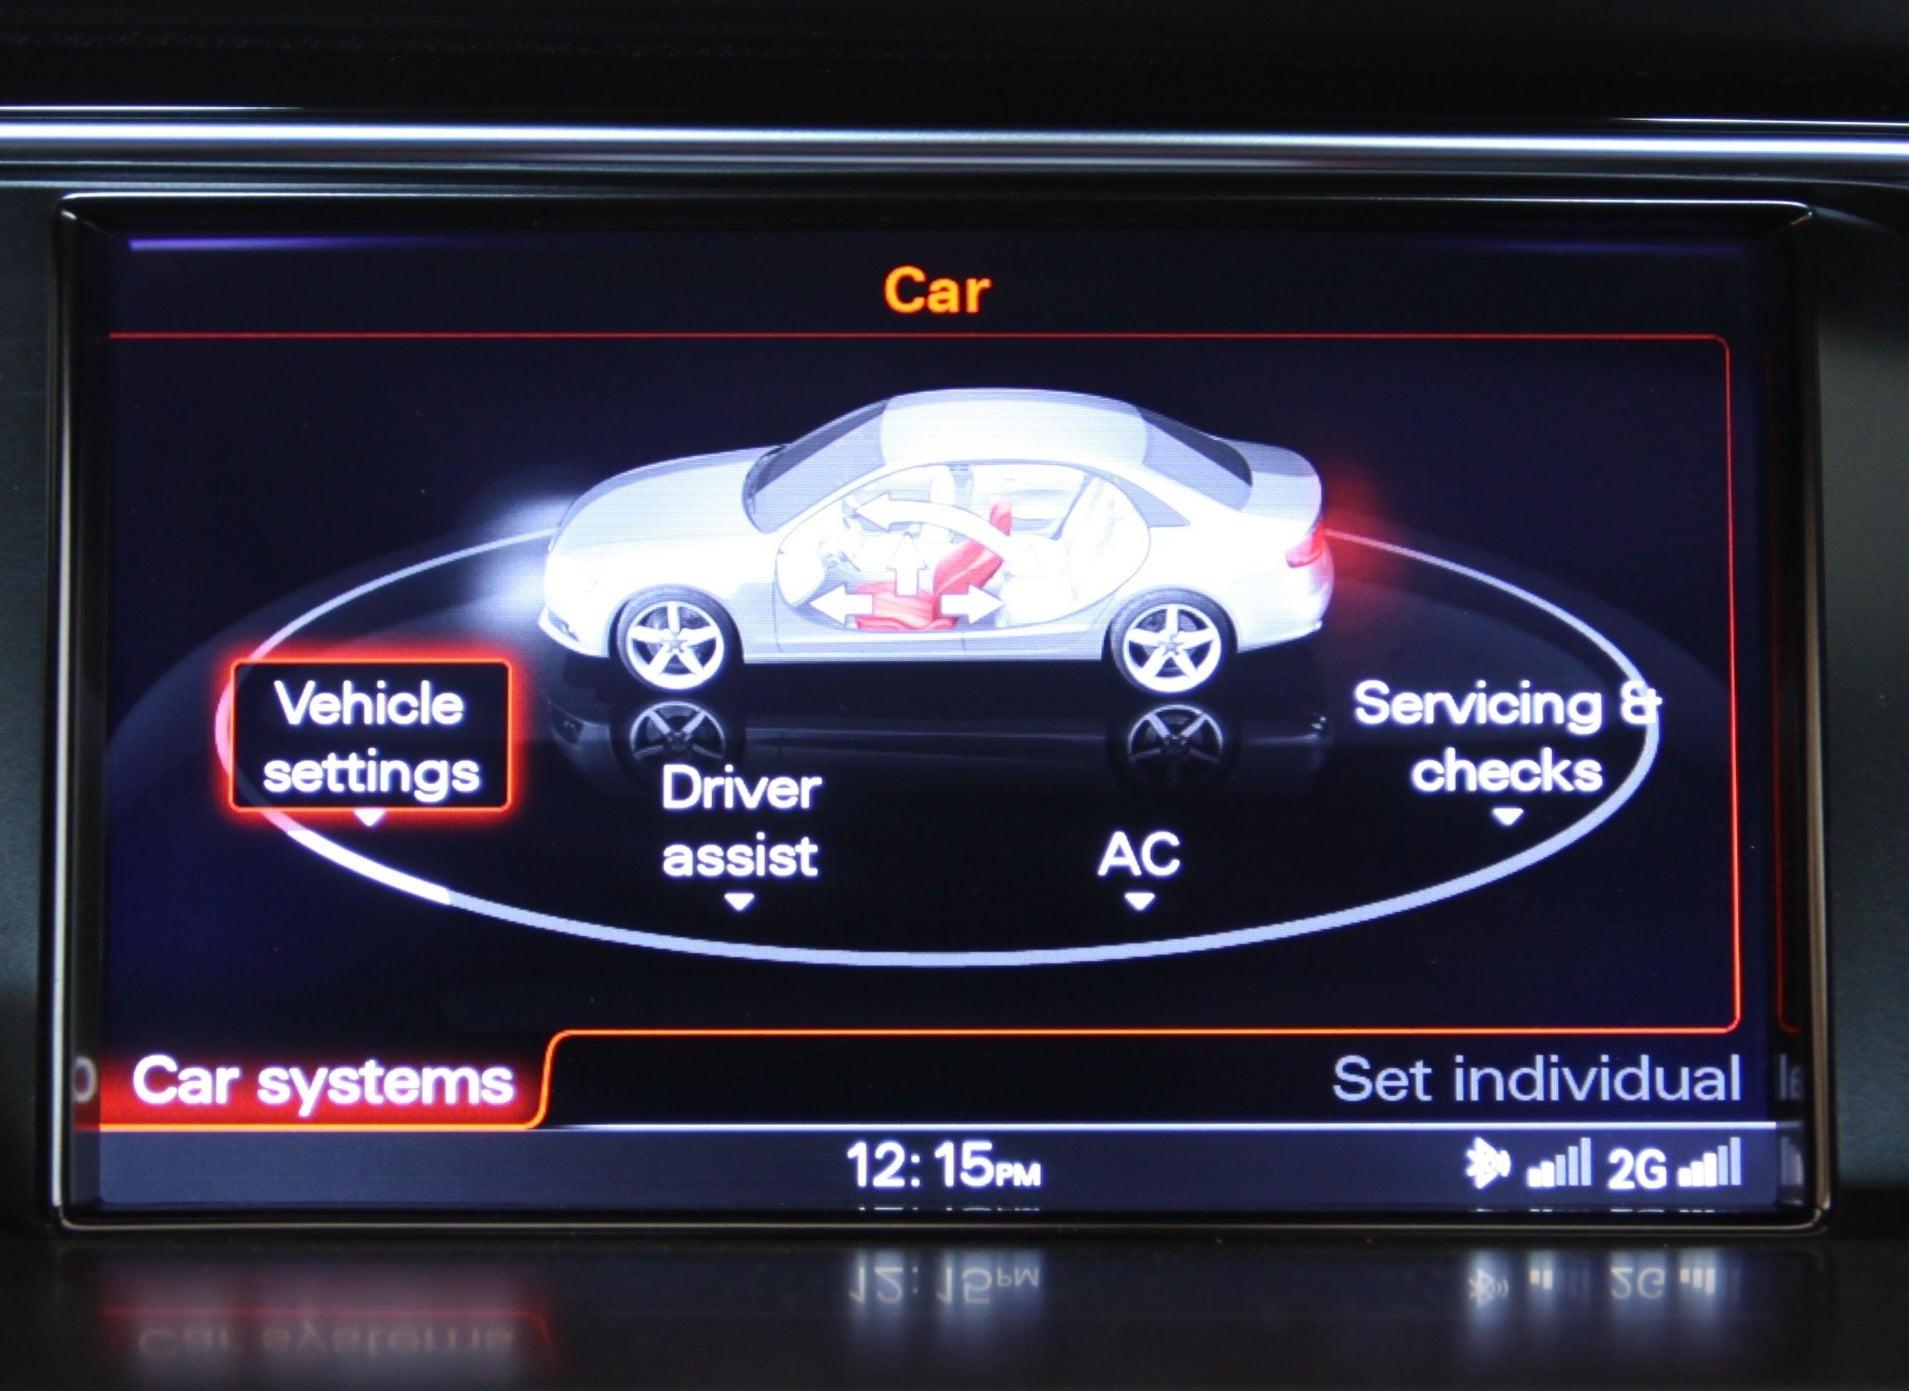 2014 Audi S4 Homelink